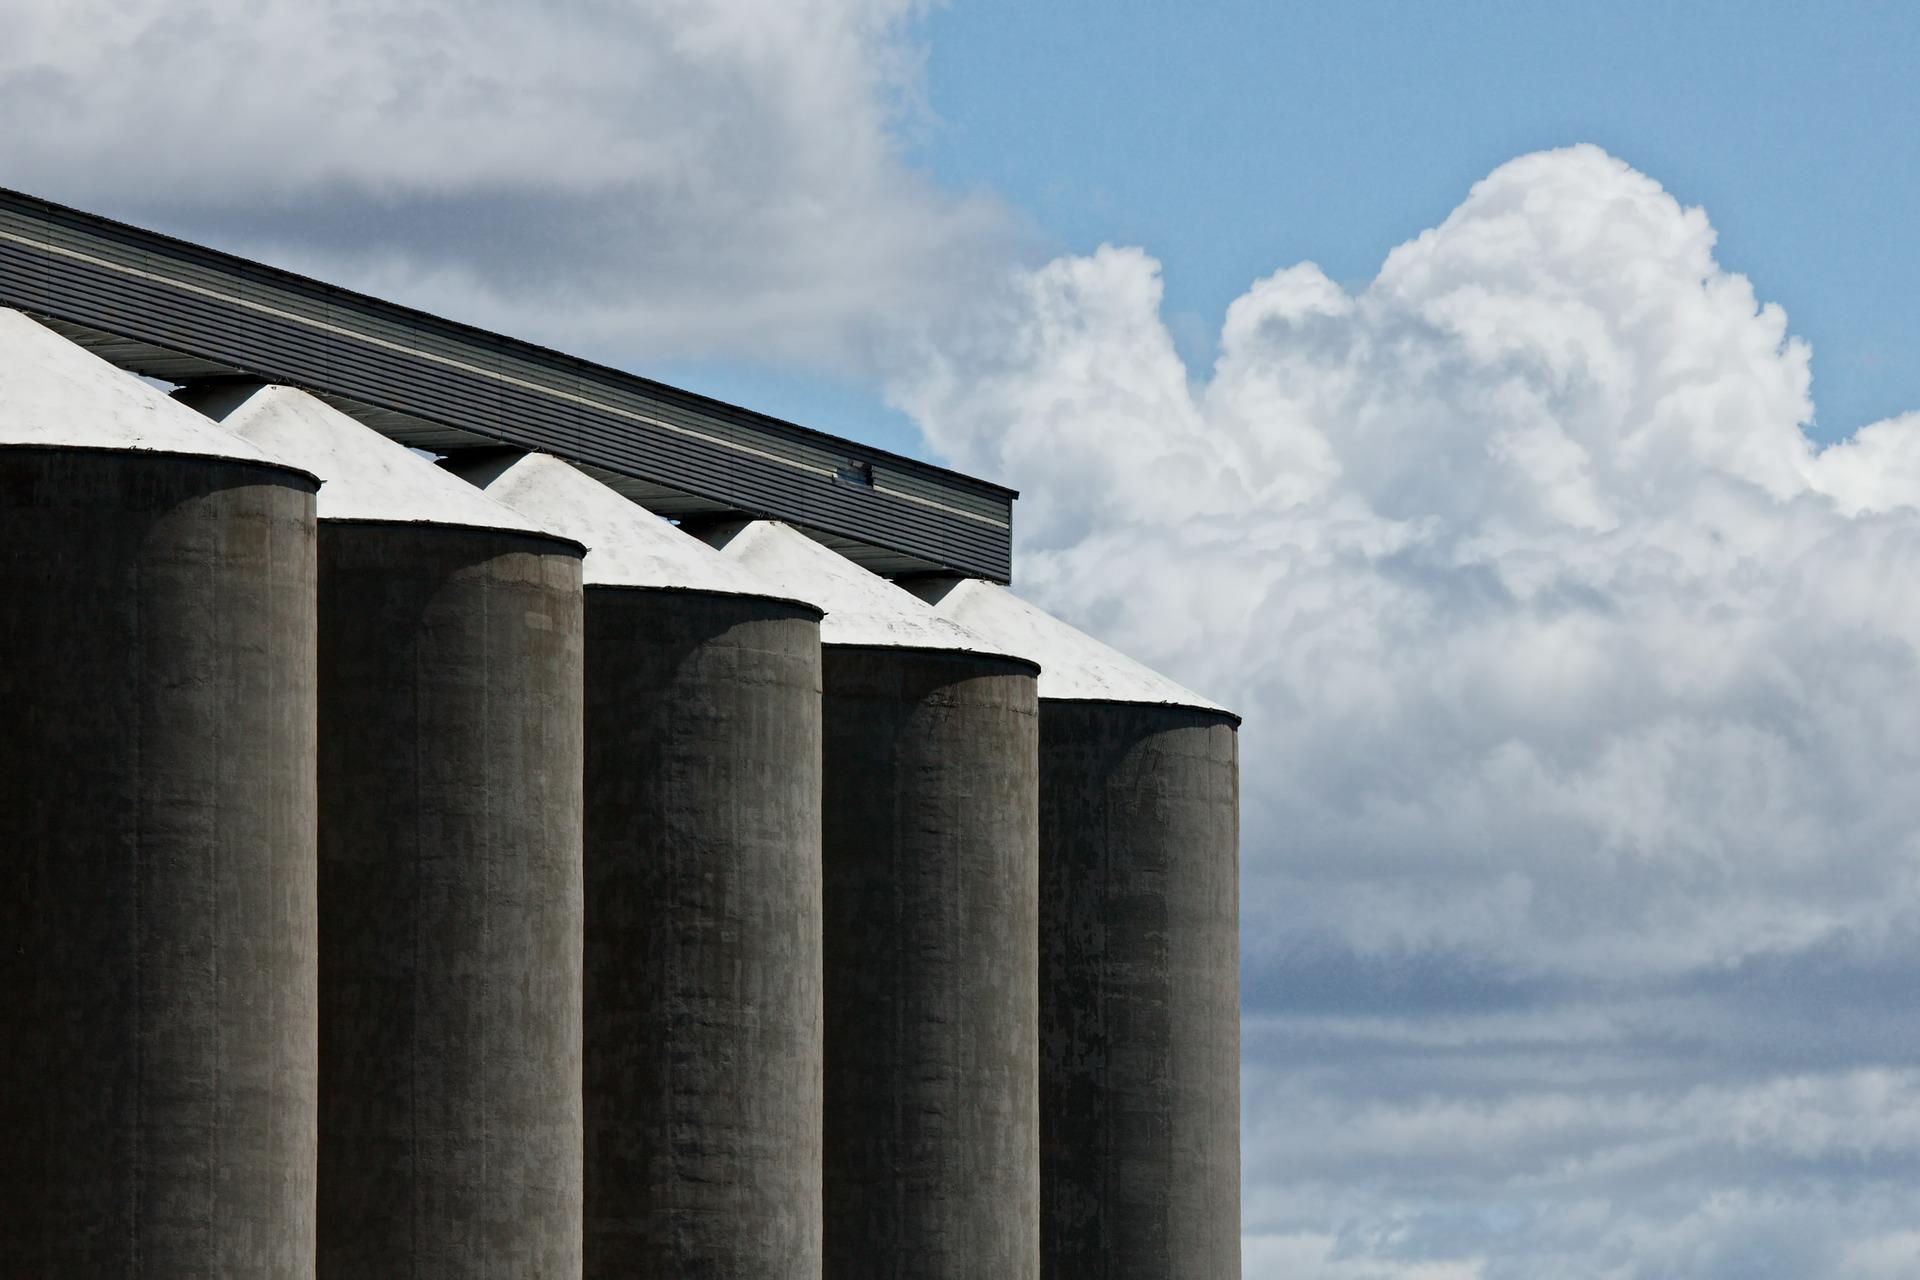 Hansen & Larsen er en totalentreprenør, som opfører gylletanke til alle landmænds behov